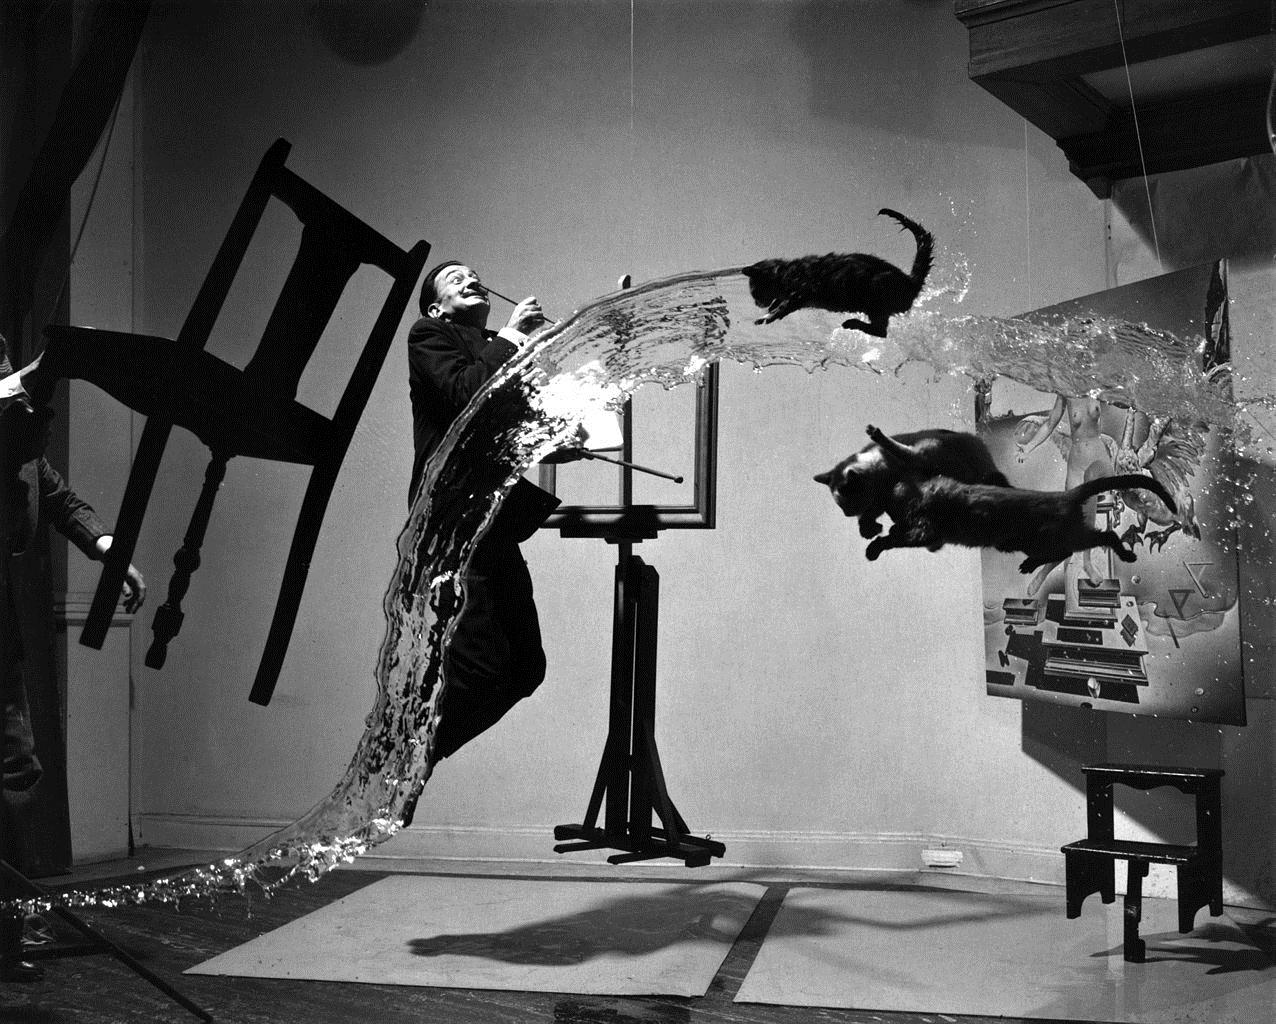 Филипп Халсман, фото Сальвадора Дали с кошками, атомикус Дали